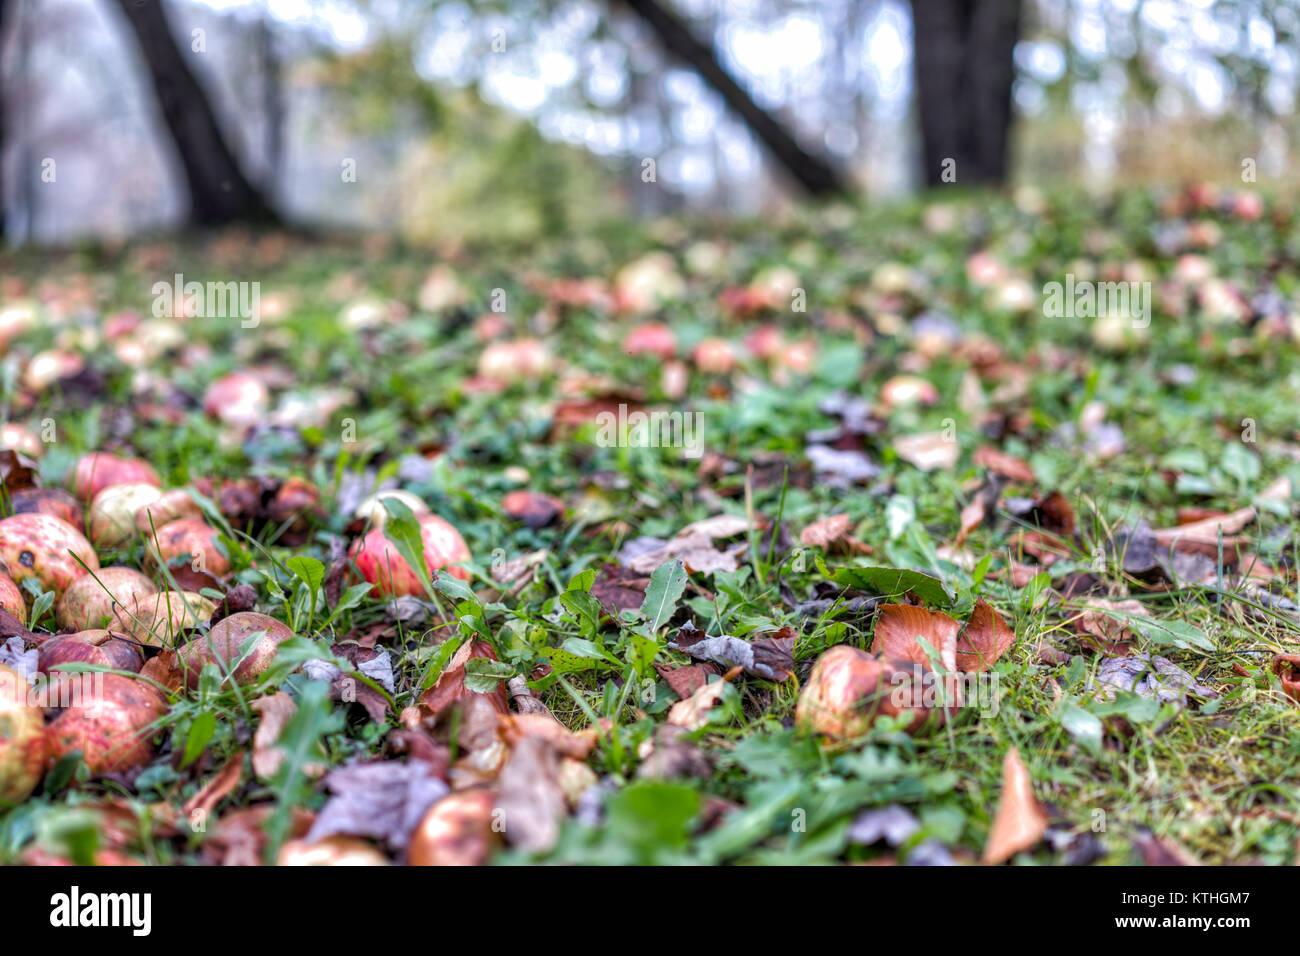 Many fallen wild fresh apples on grass ground bruised on apple picking farm closeup - Stock Image